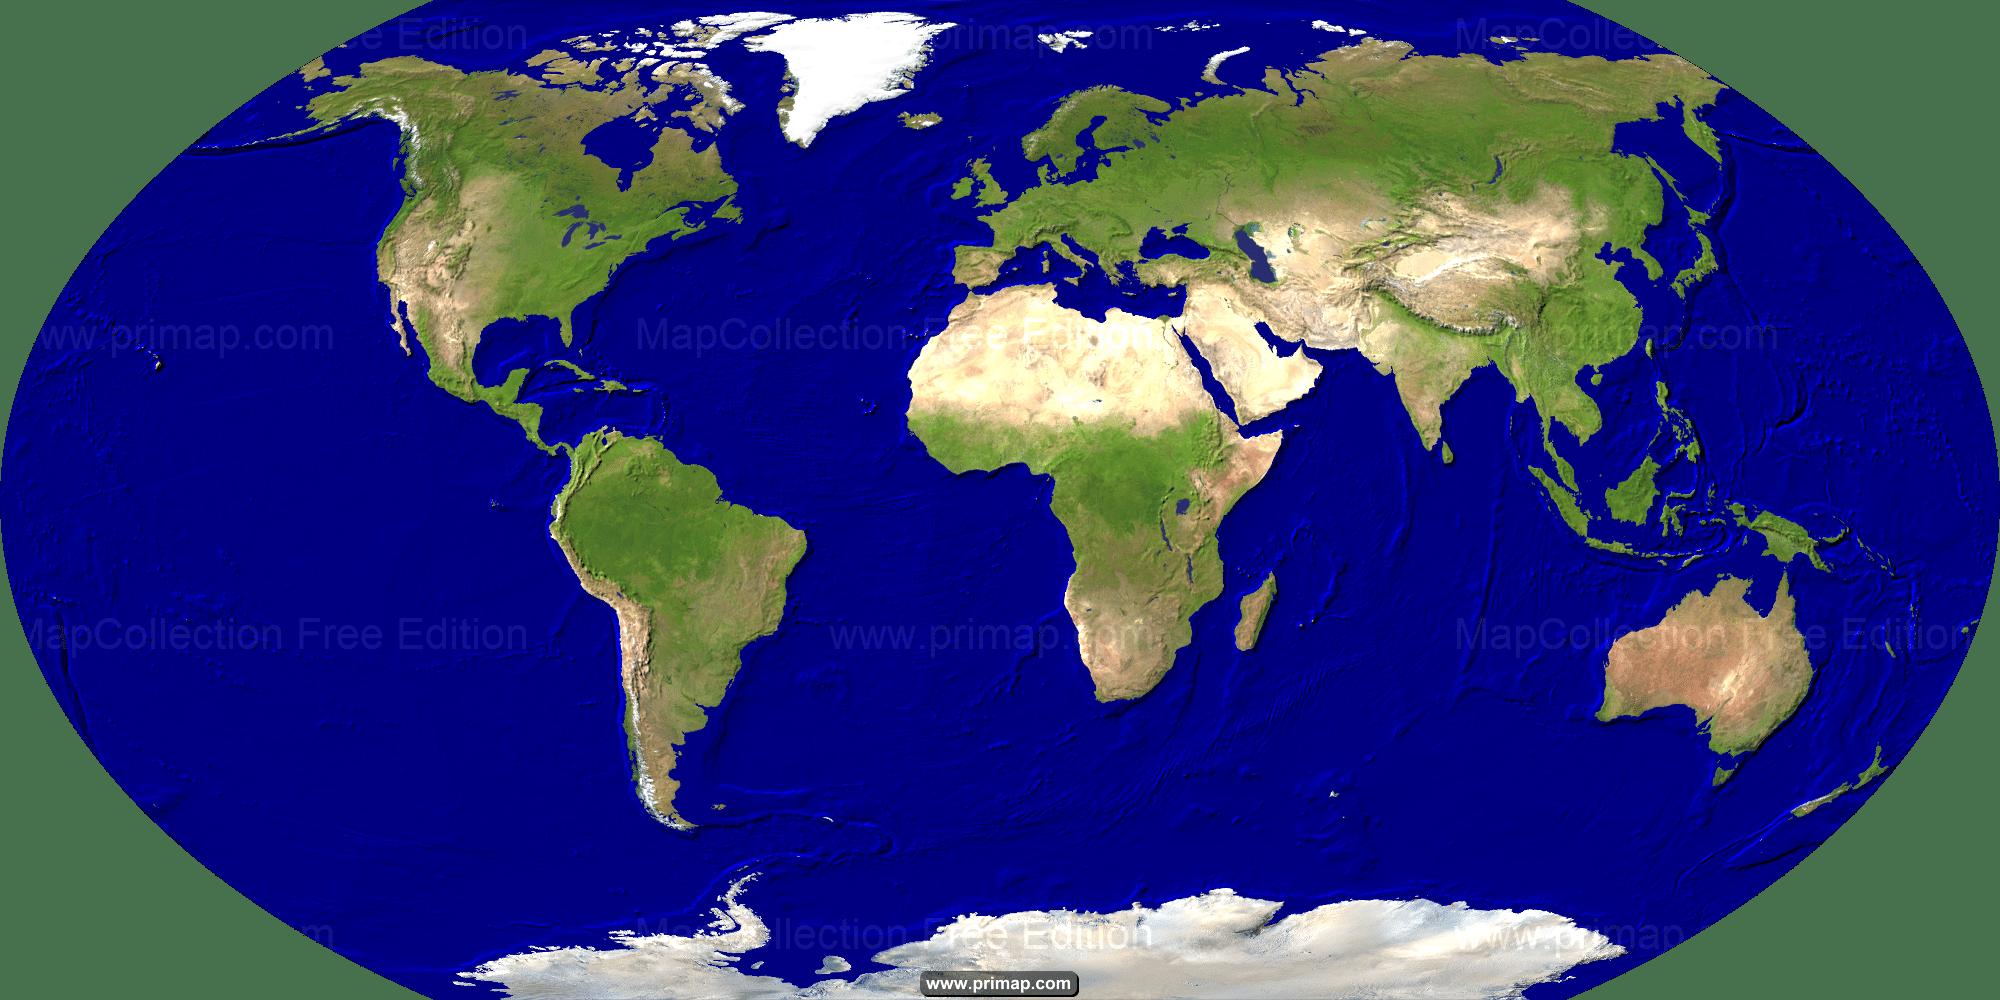 World map satellite image free hd images world map satellite image gumiabroncs Images